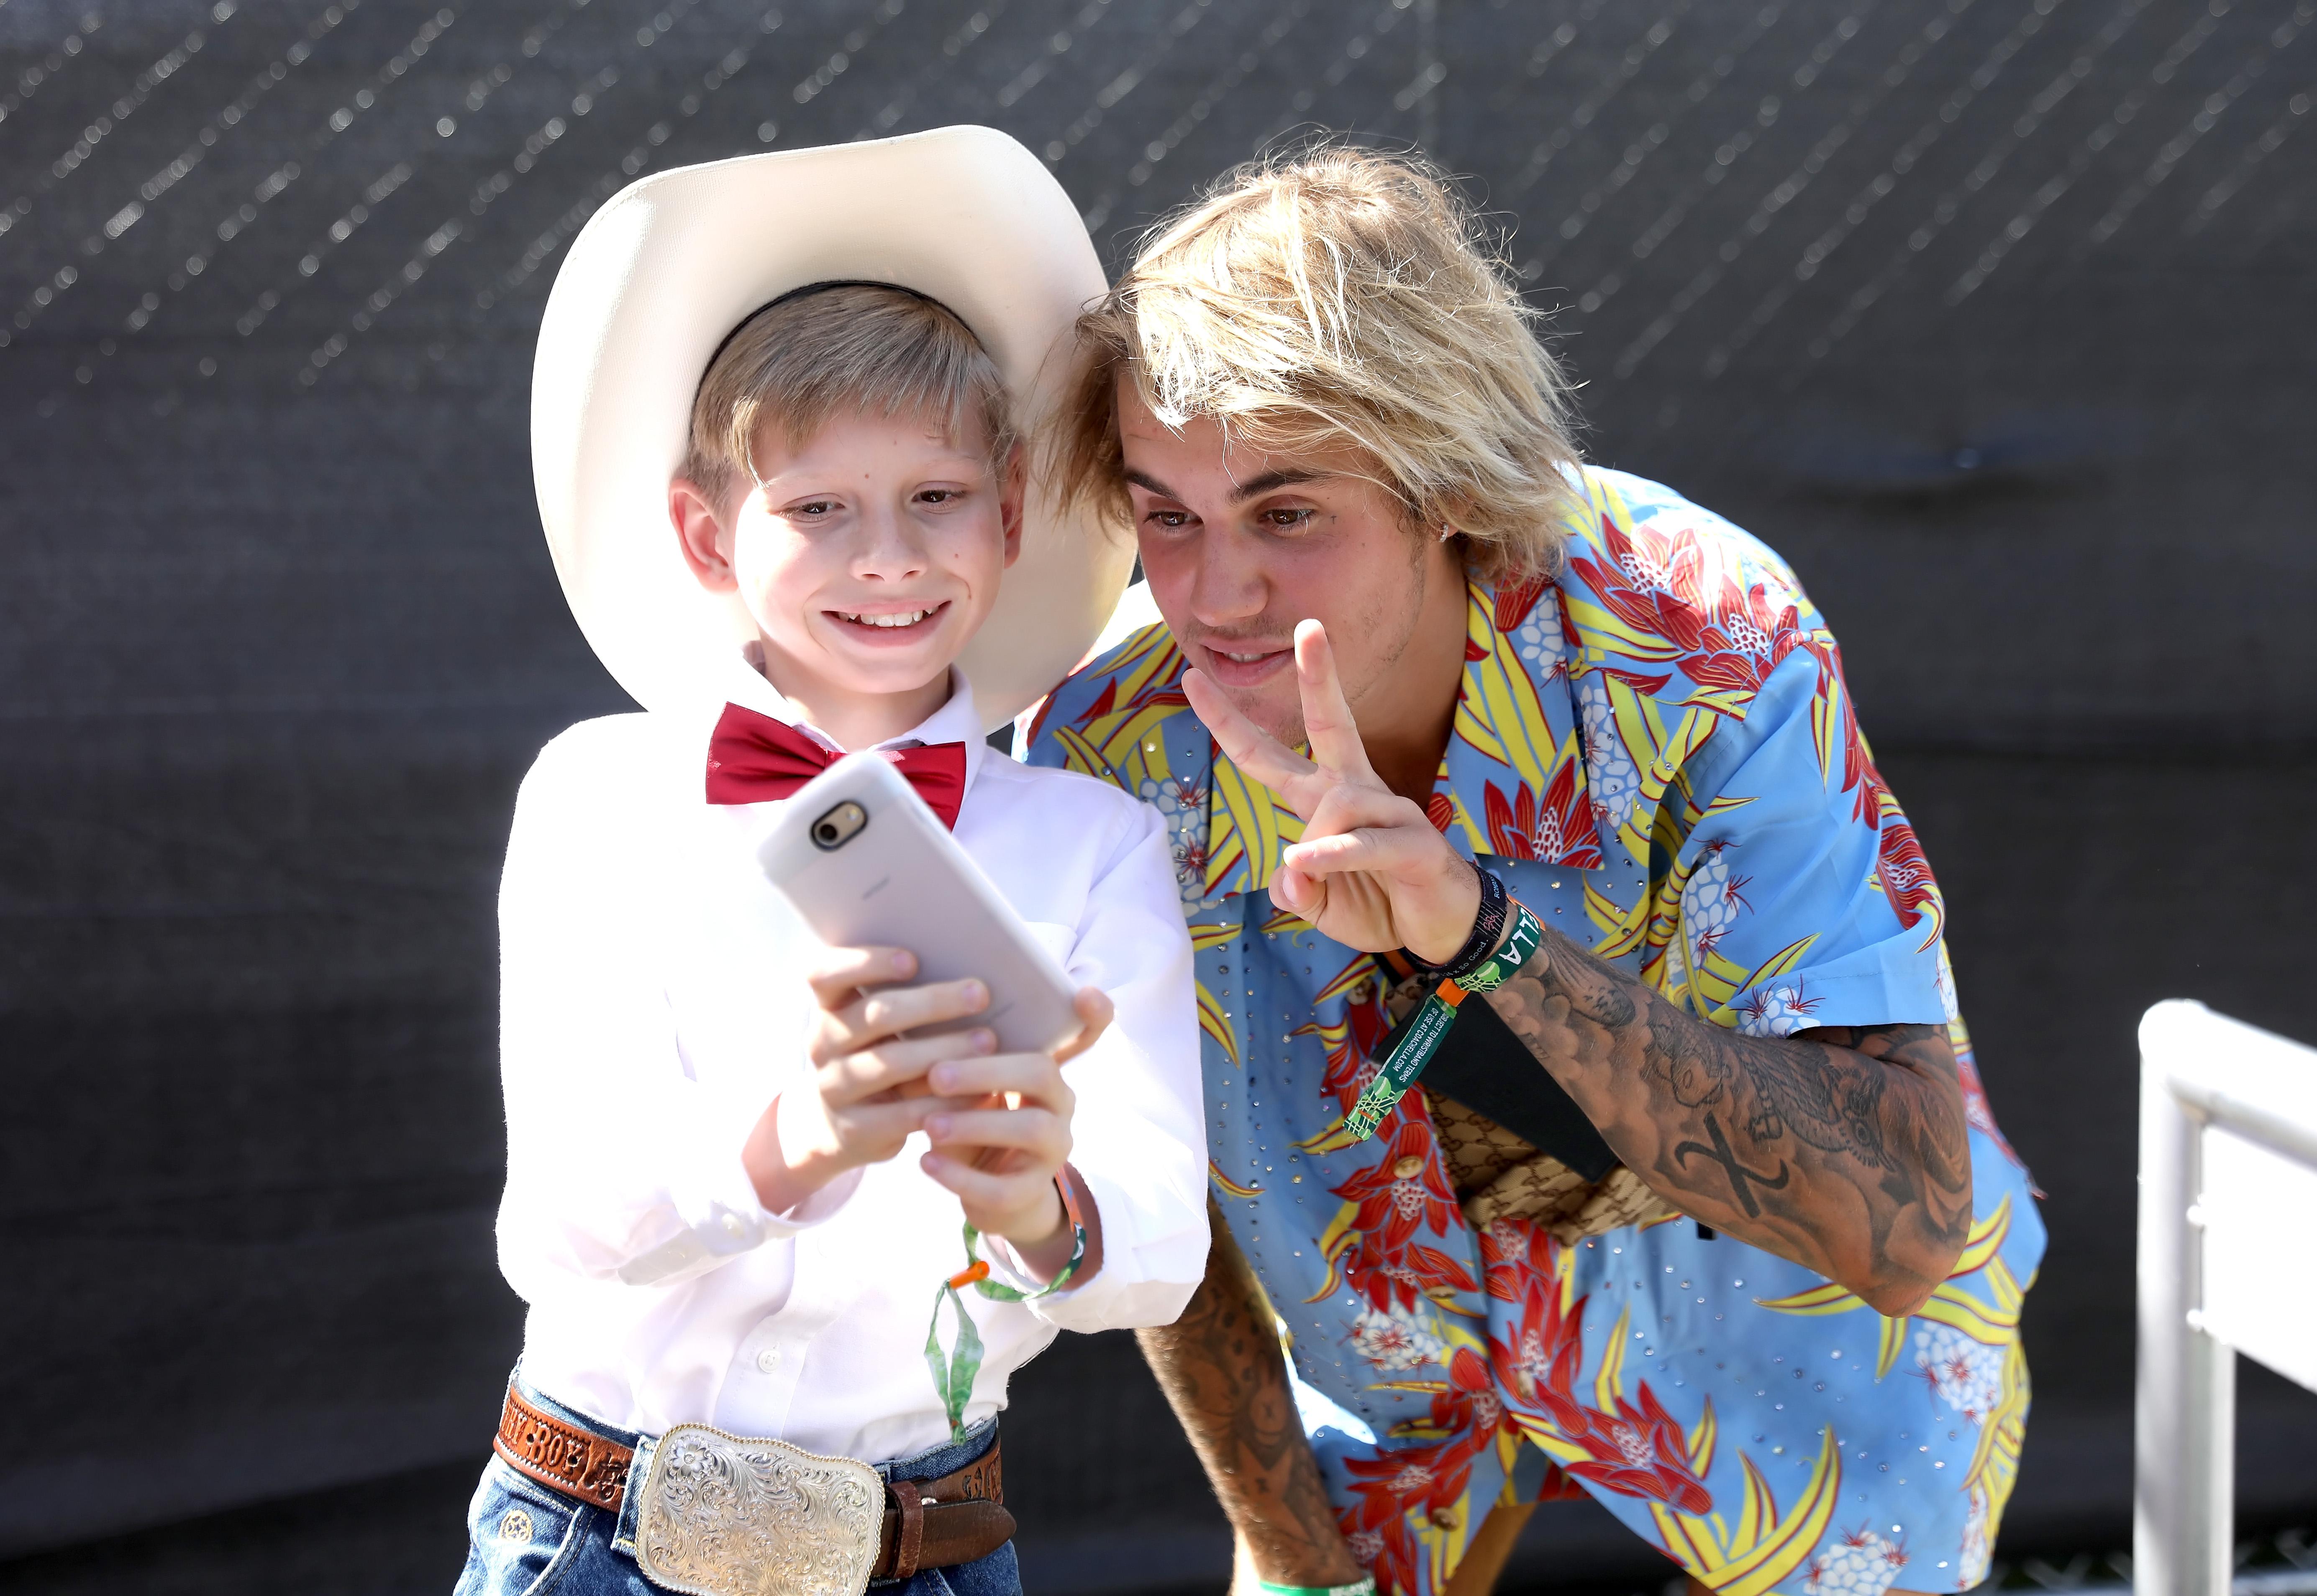 Yodeling-Walmart-Kid-Meets-Justin-Bieber-At-Coachella